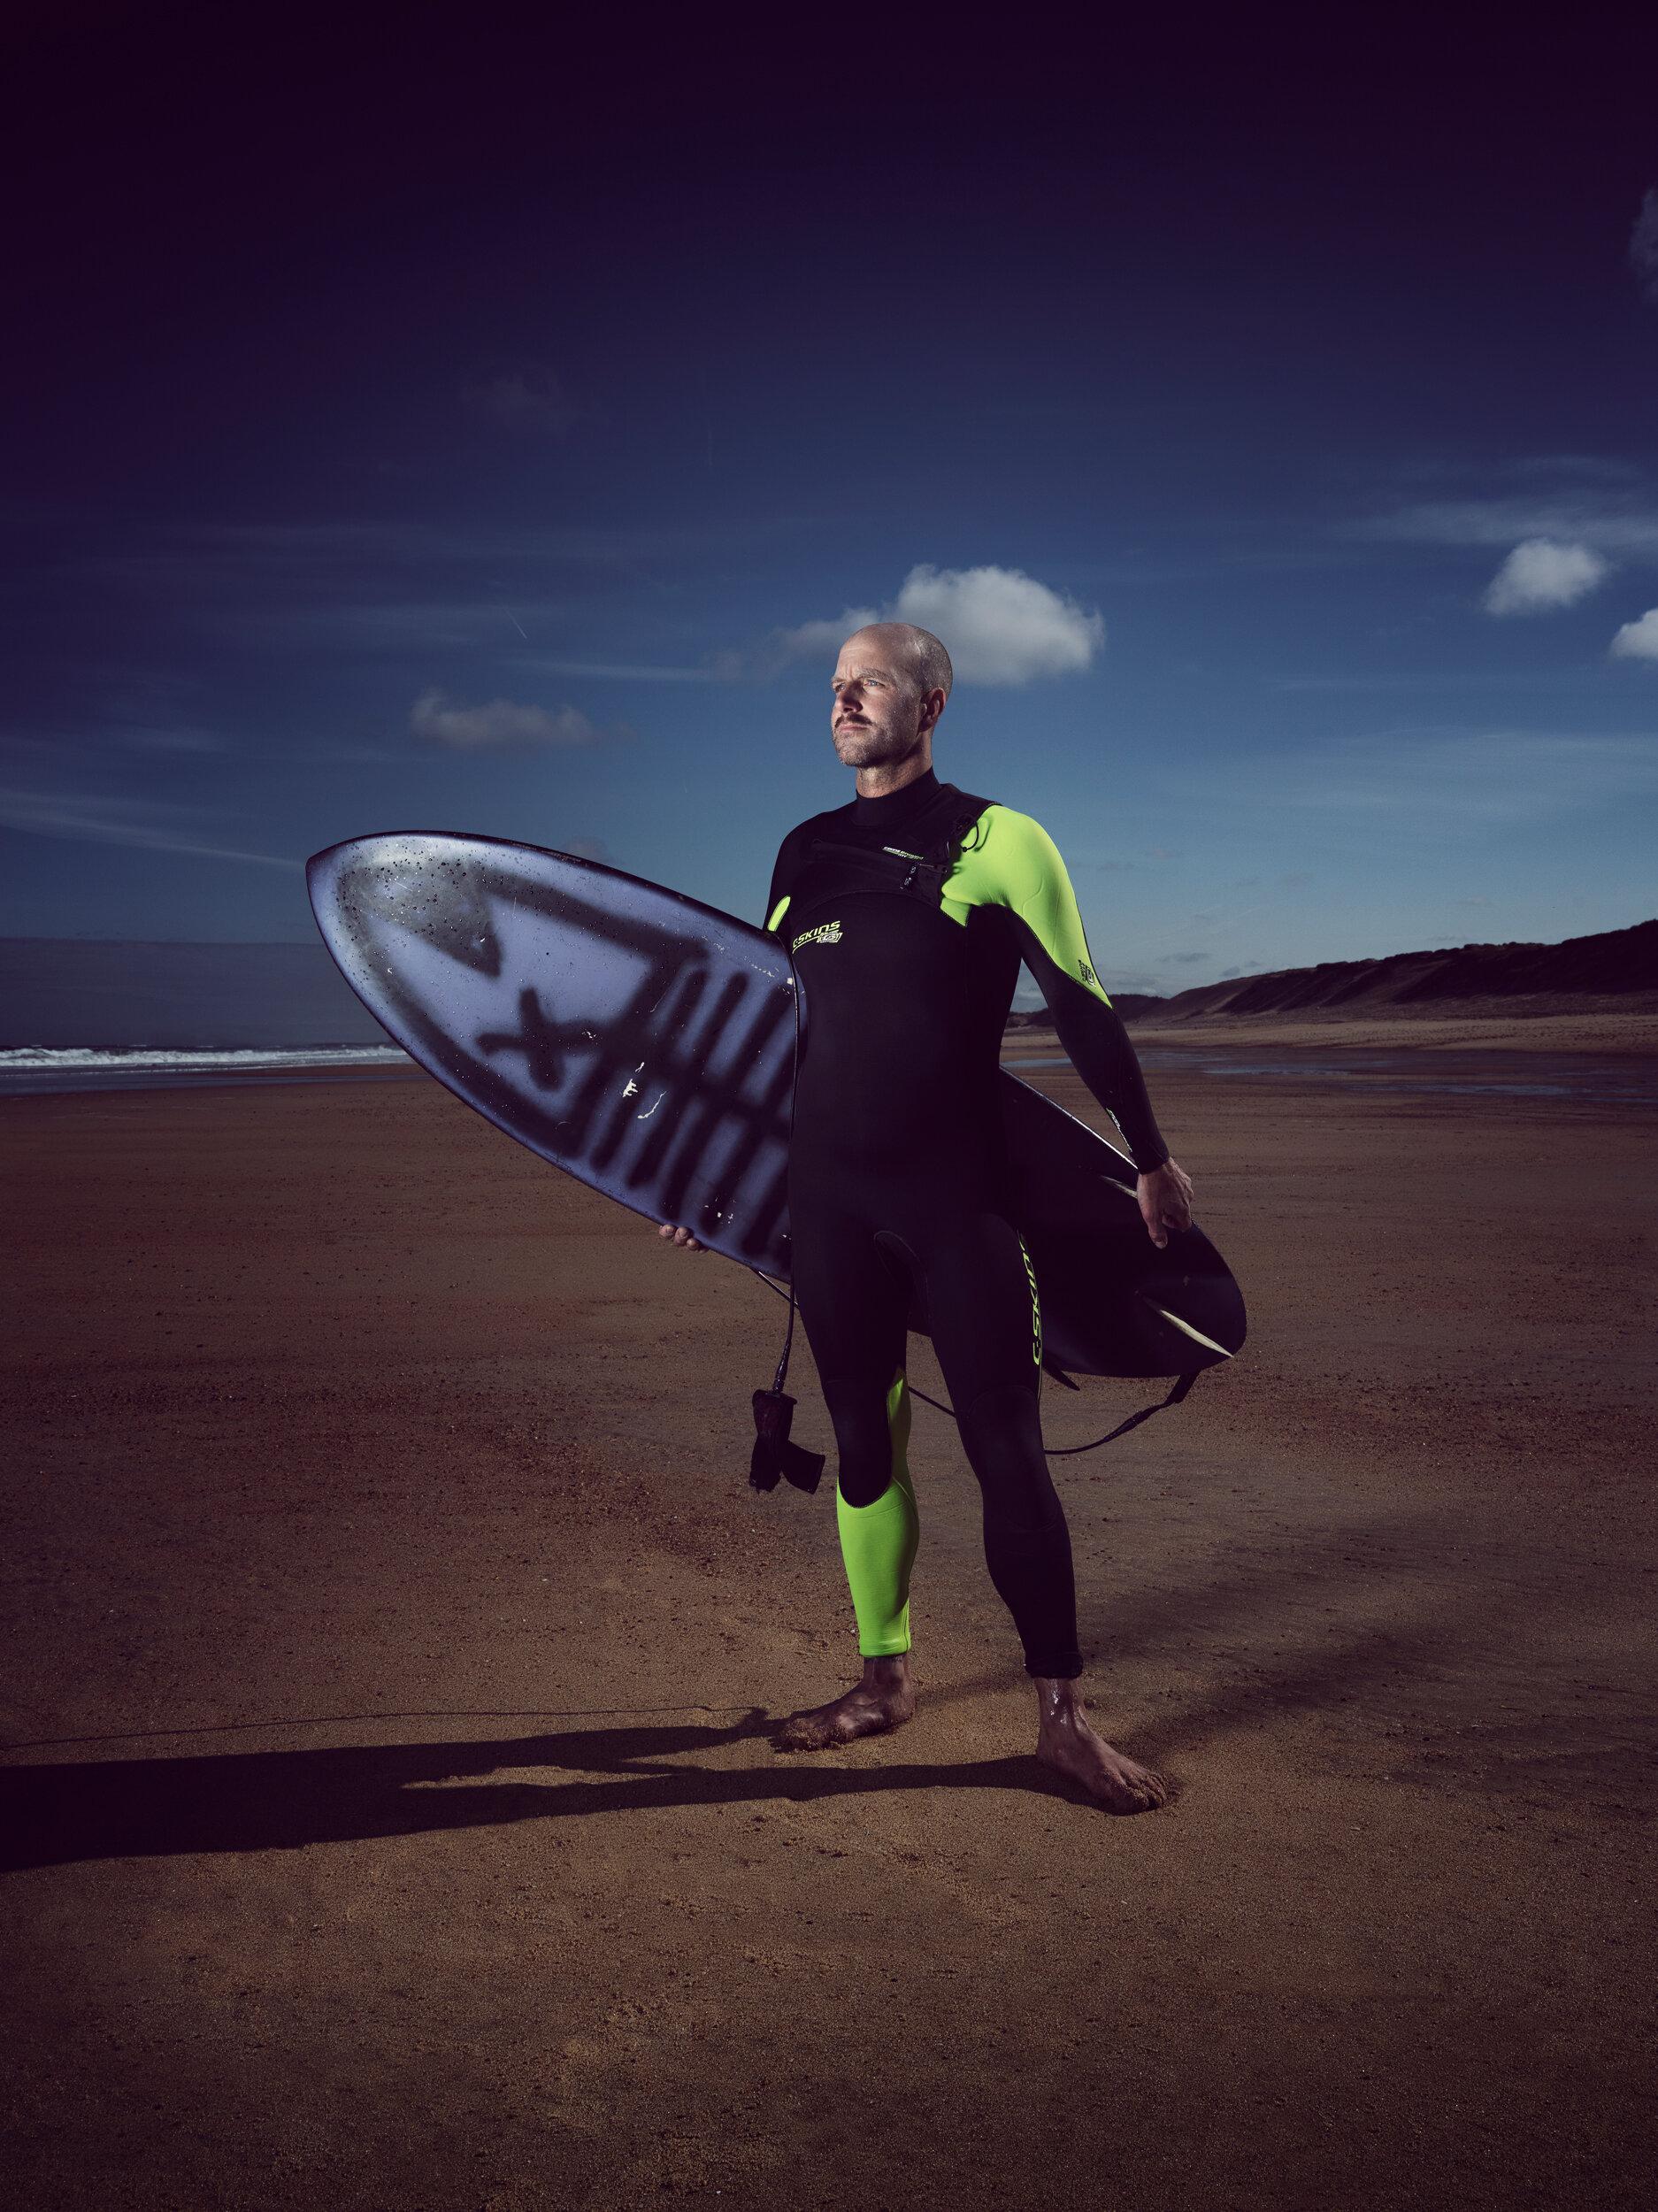 Surf_3.jpg